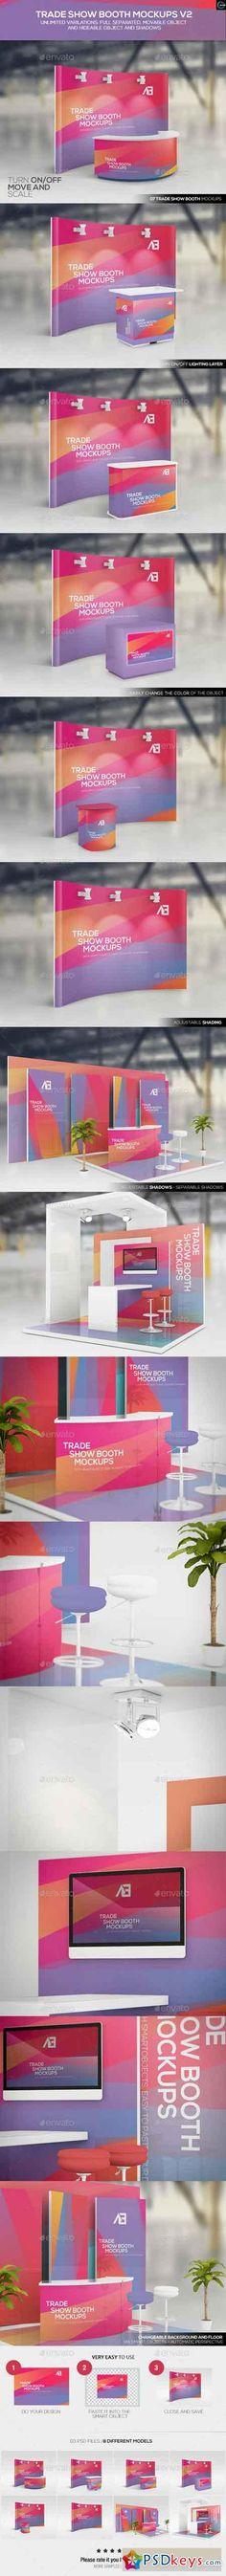 Trade Show Booth Mockups V2 11170591